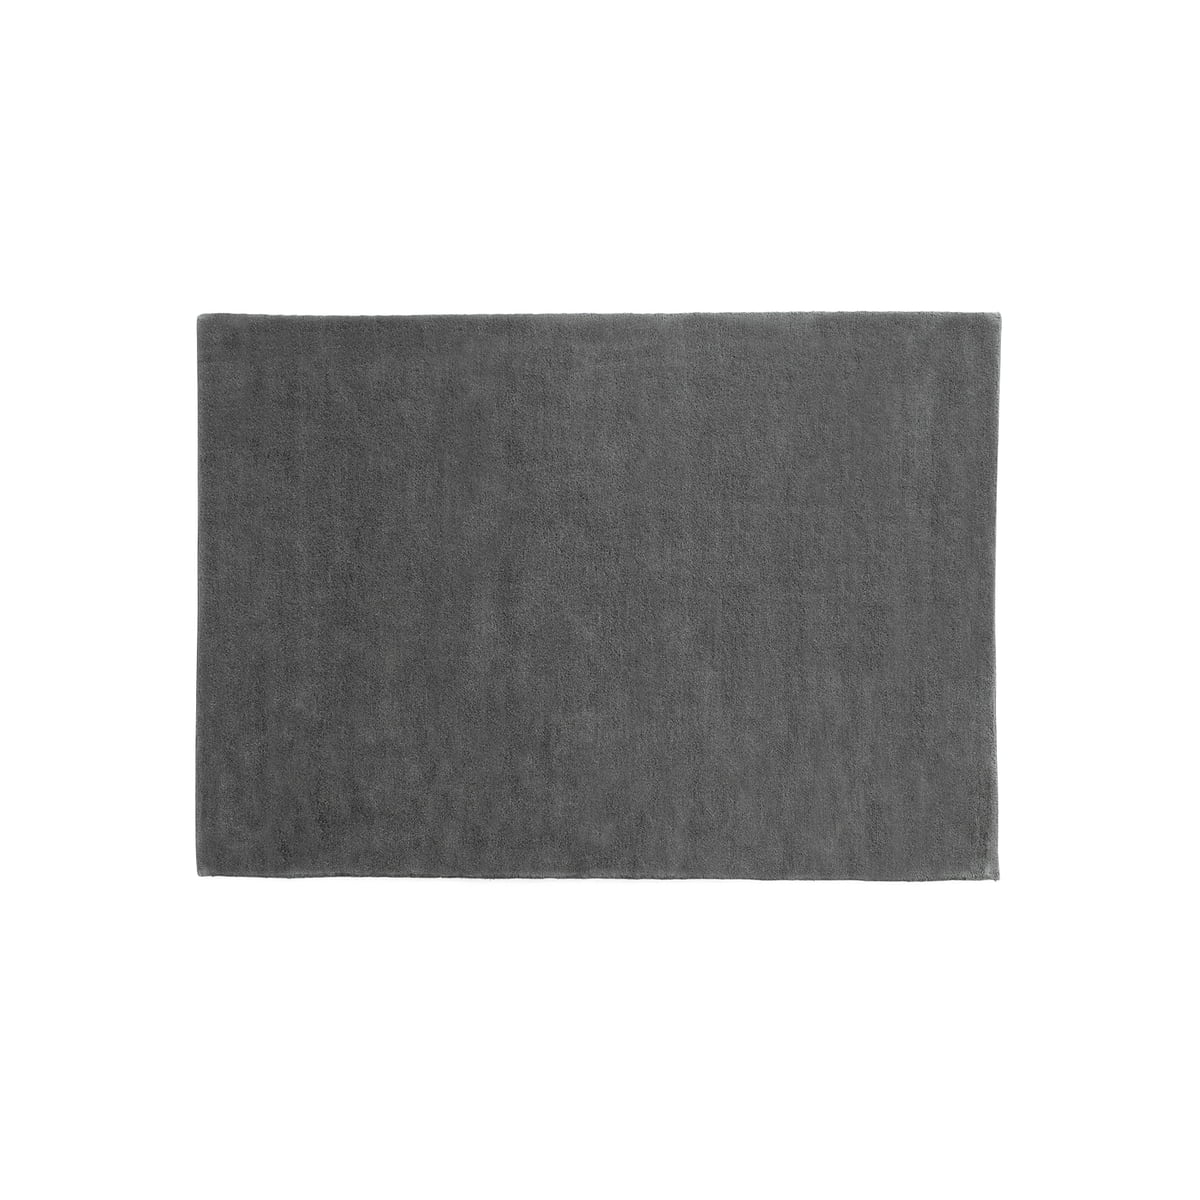 Hay Teppich rug 2 by hay connox